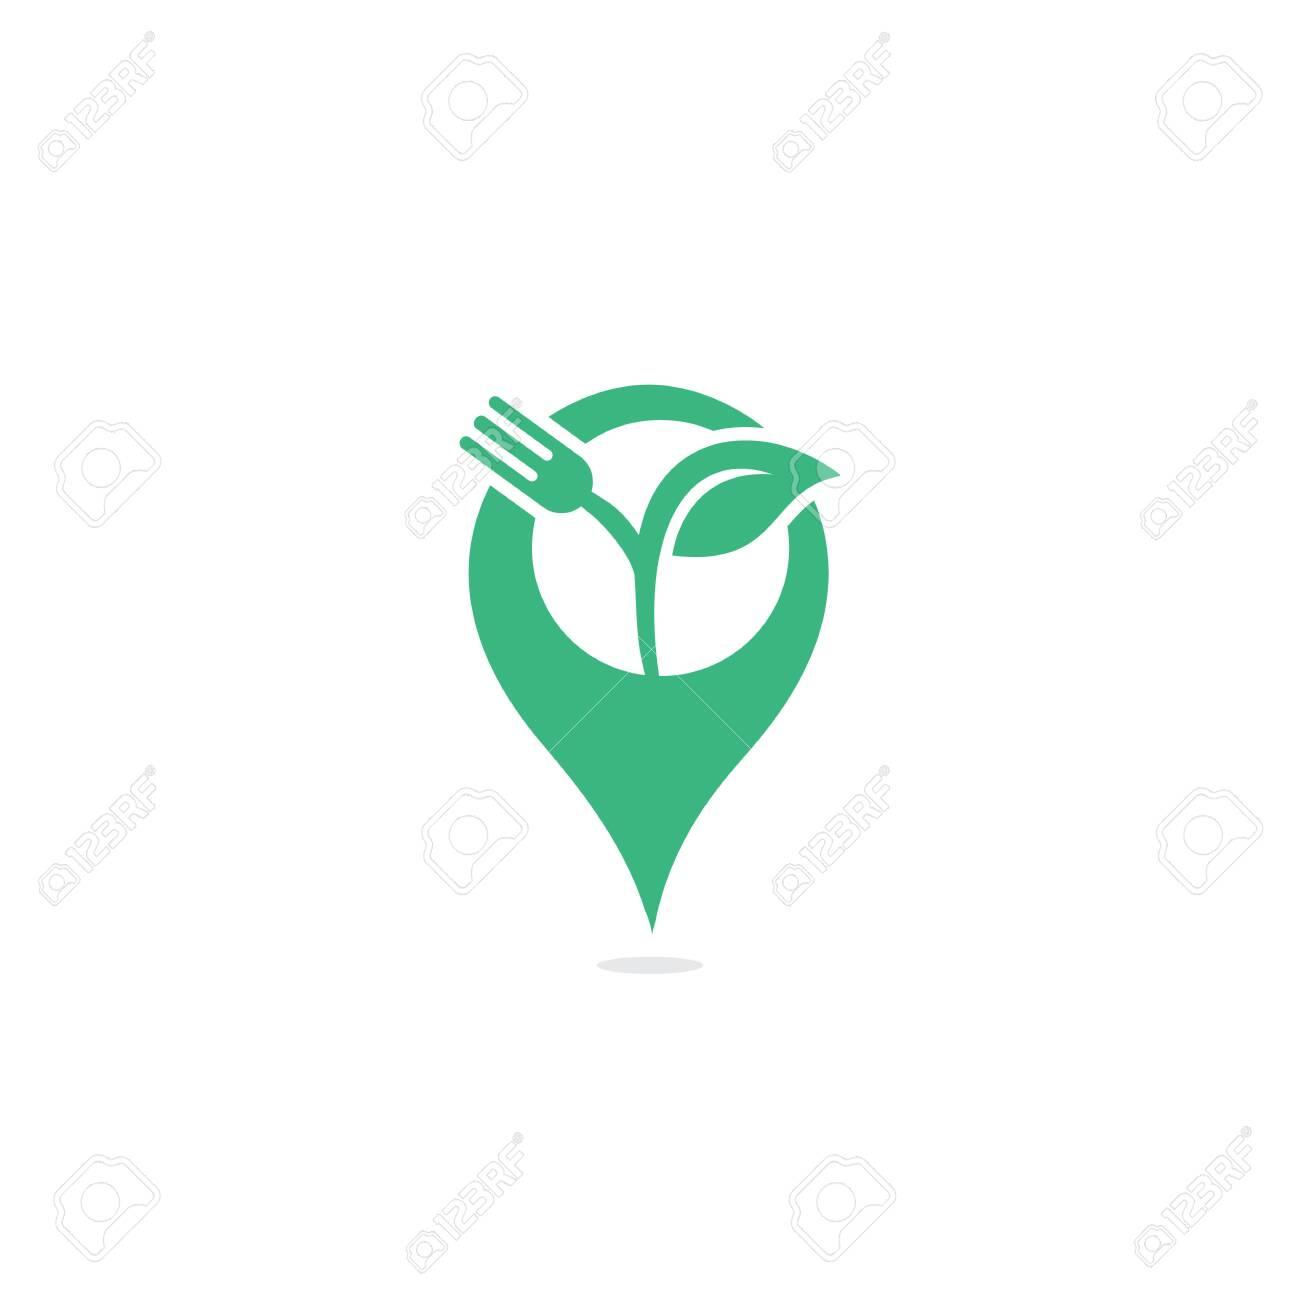 Fork Leaf And Gps Sign Vector Logo Design Organic Food Restaurant Or Cafe Logo Concept With Fork And Leaf Ilustraciones Vectoriales Clip Art Vectorizado Libre De Derechos Image 149570364